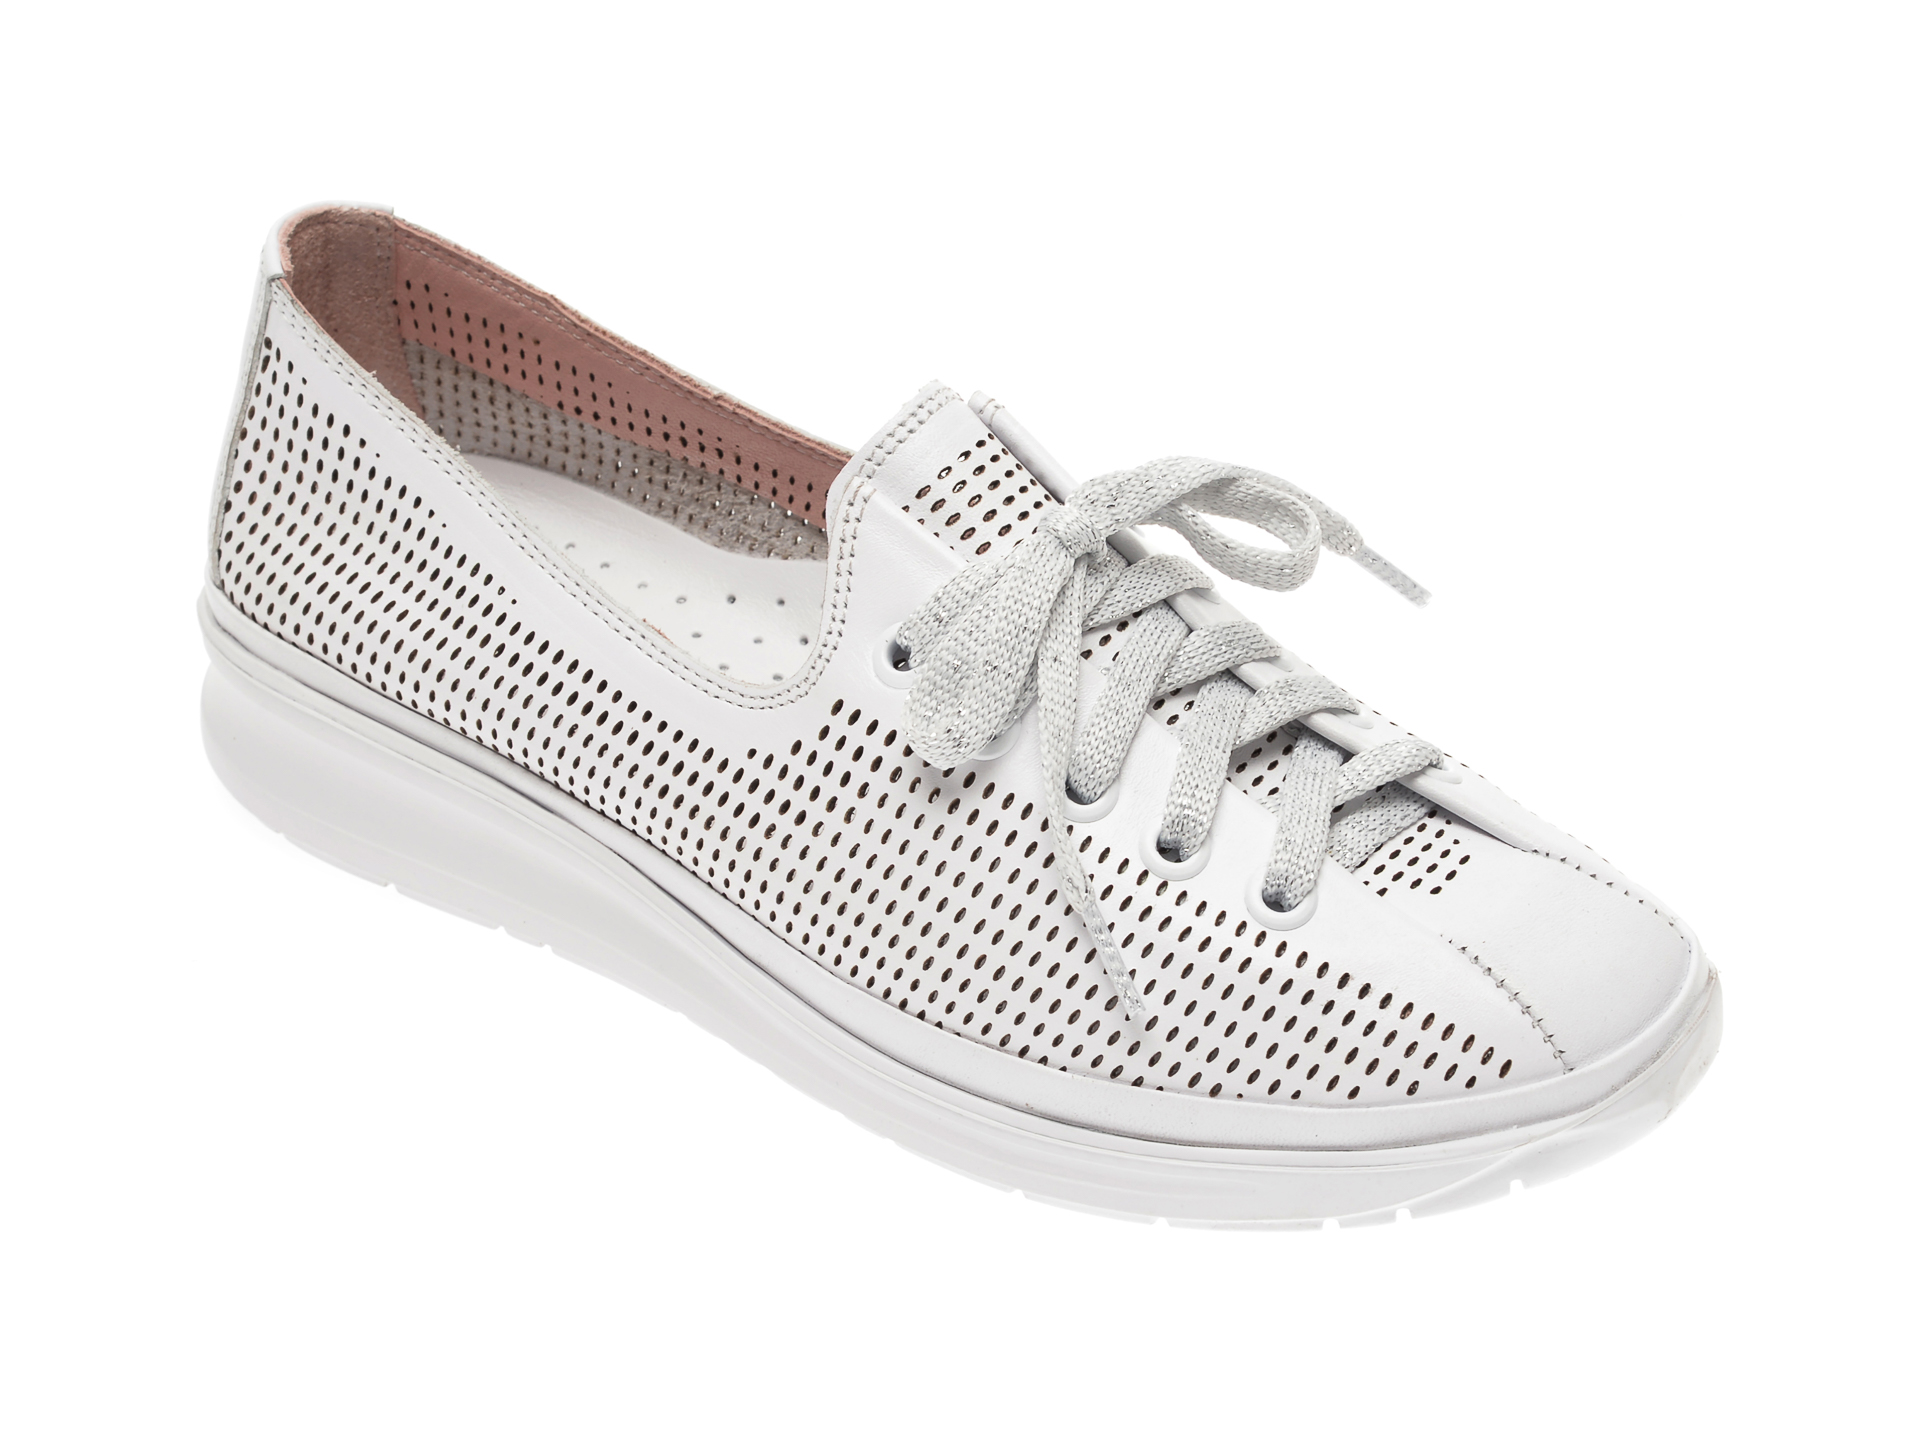 Pantofi FLAVIA PASSINI albi, 0182096, din piele naturala